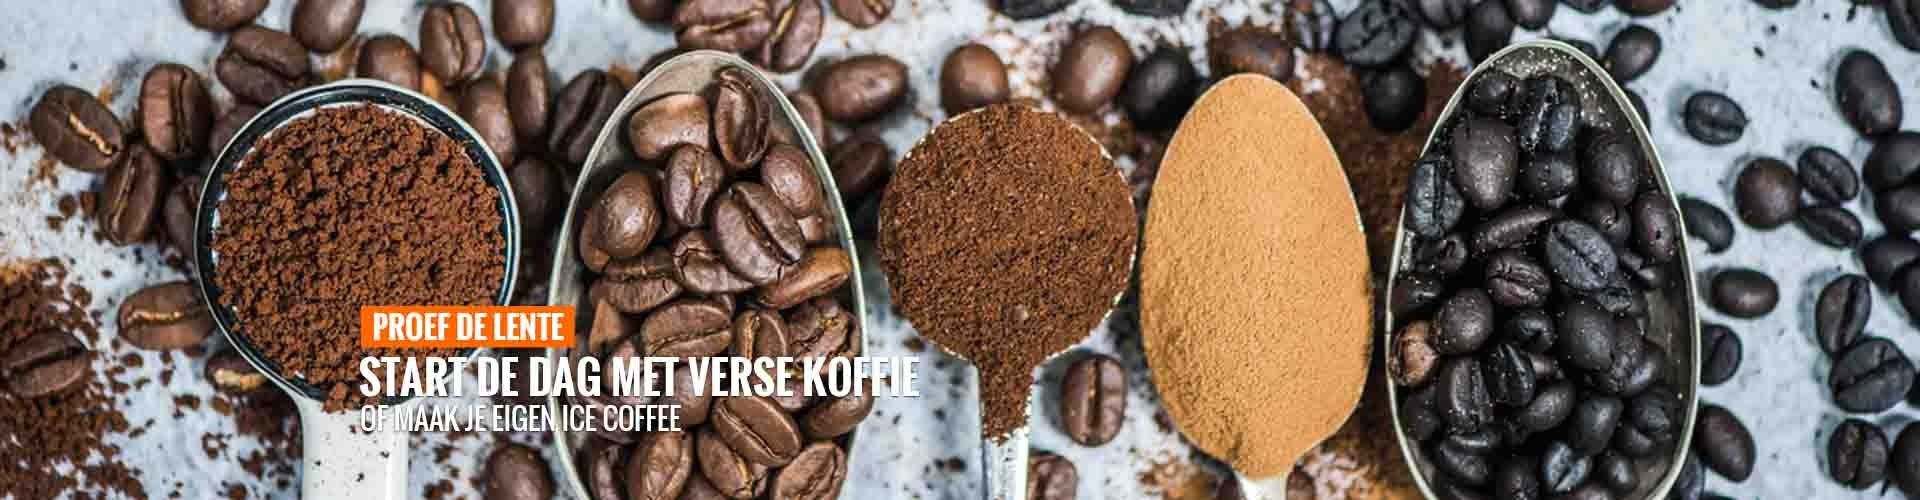 Proef de lente koffie